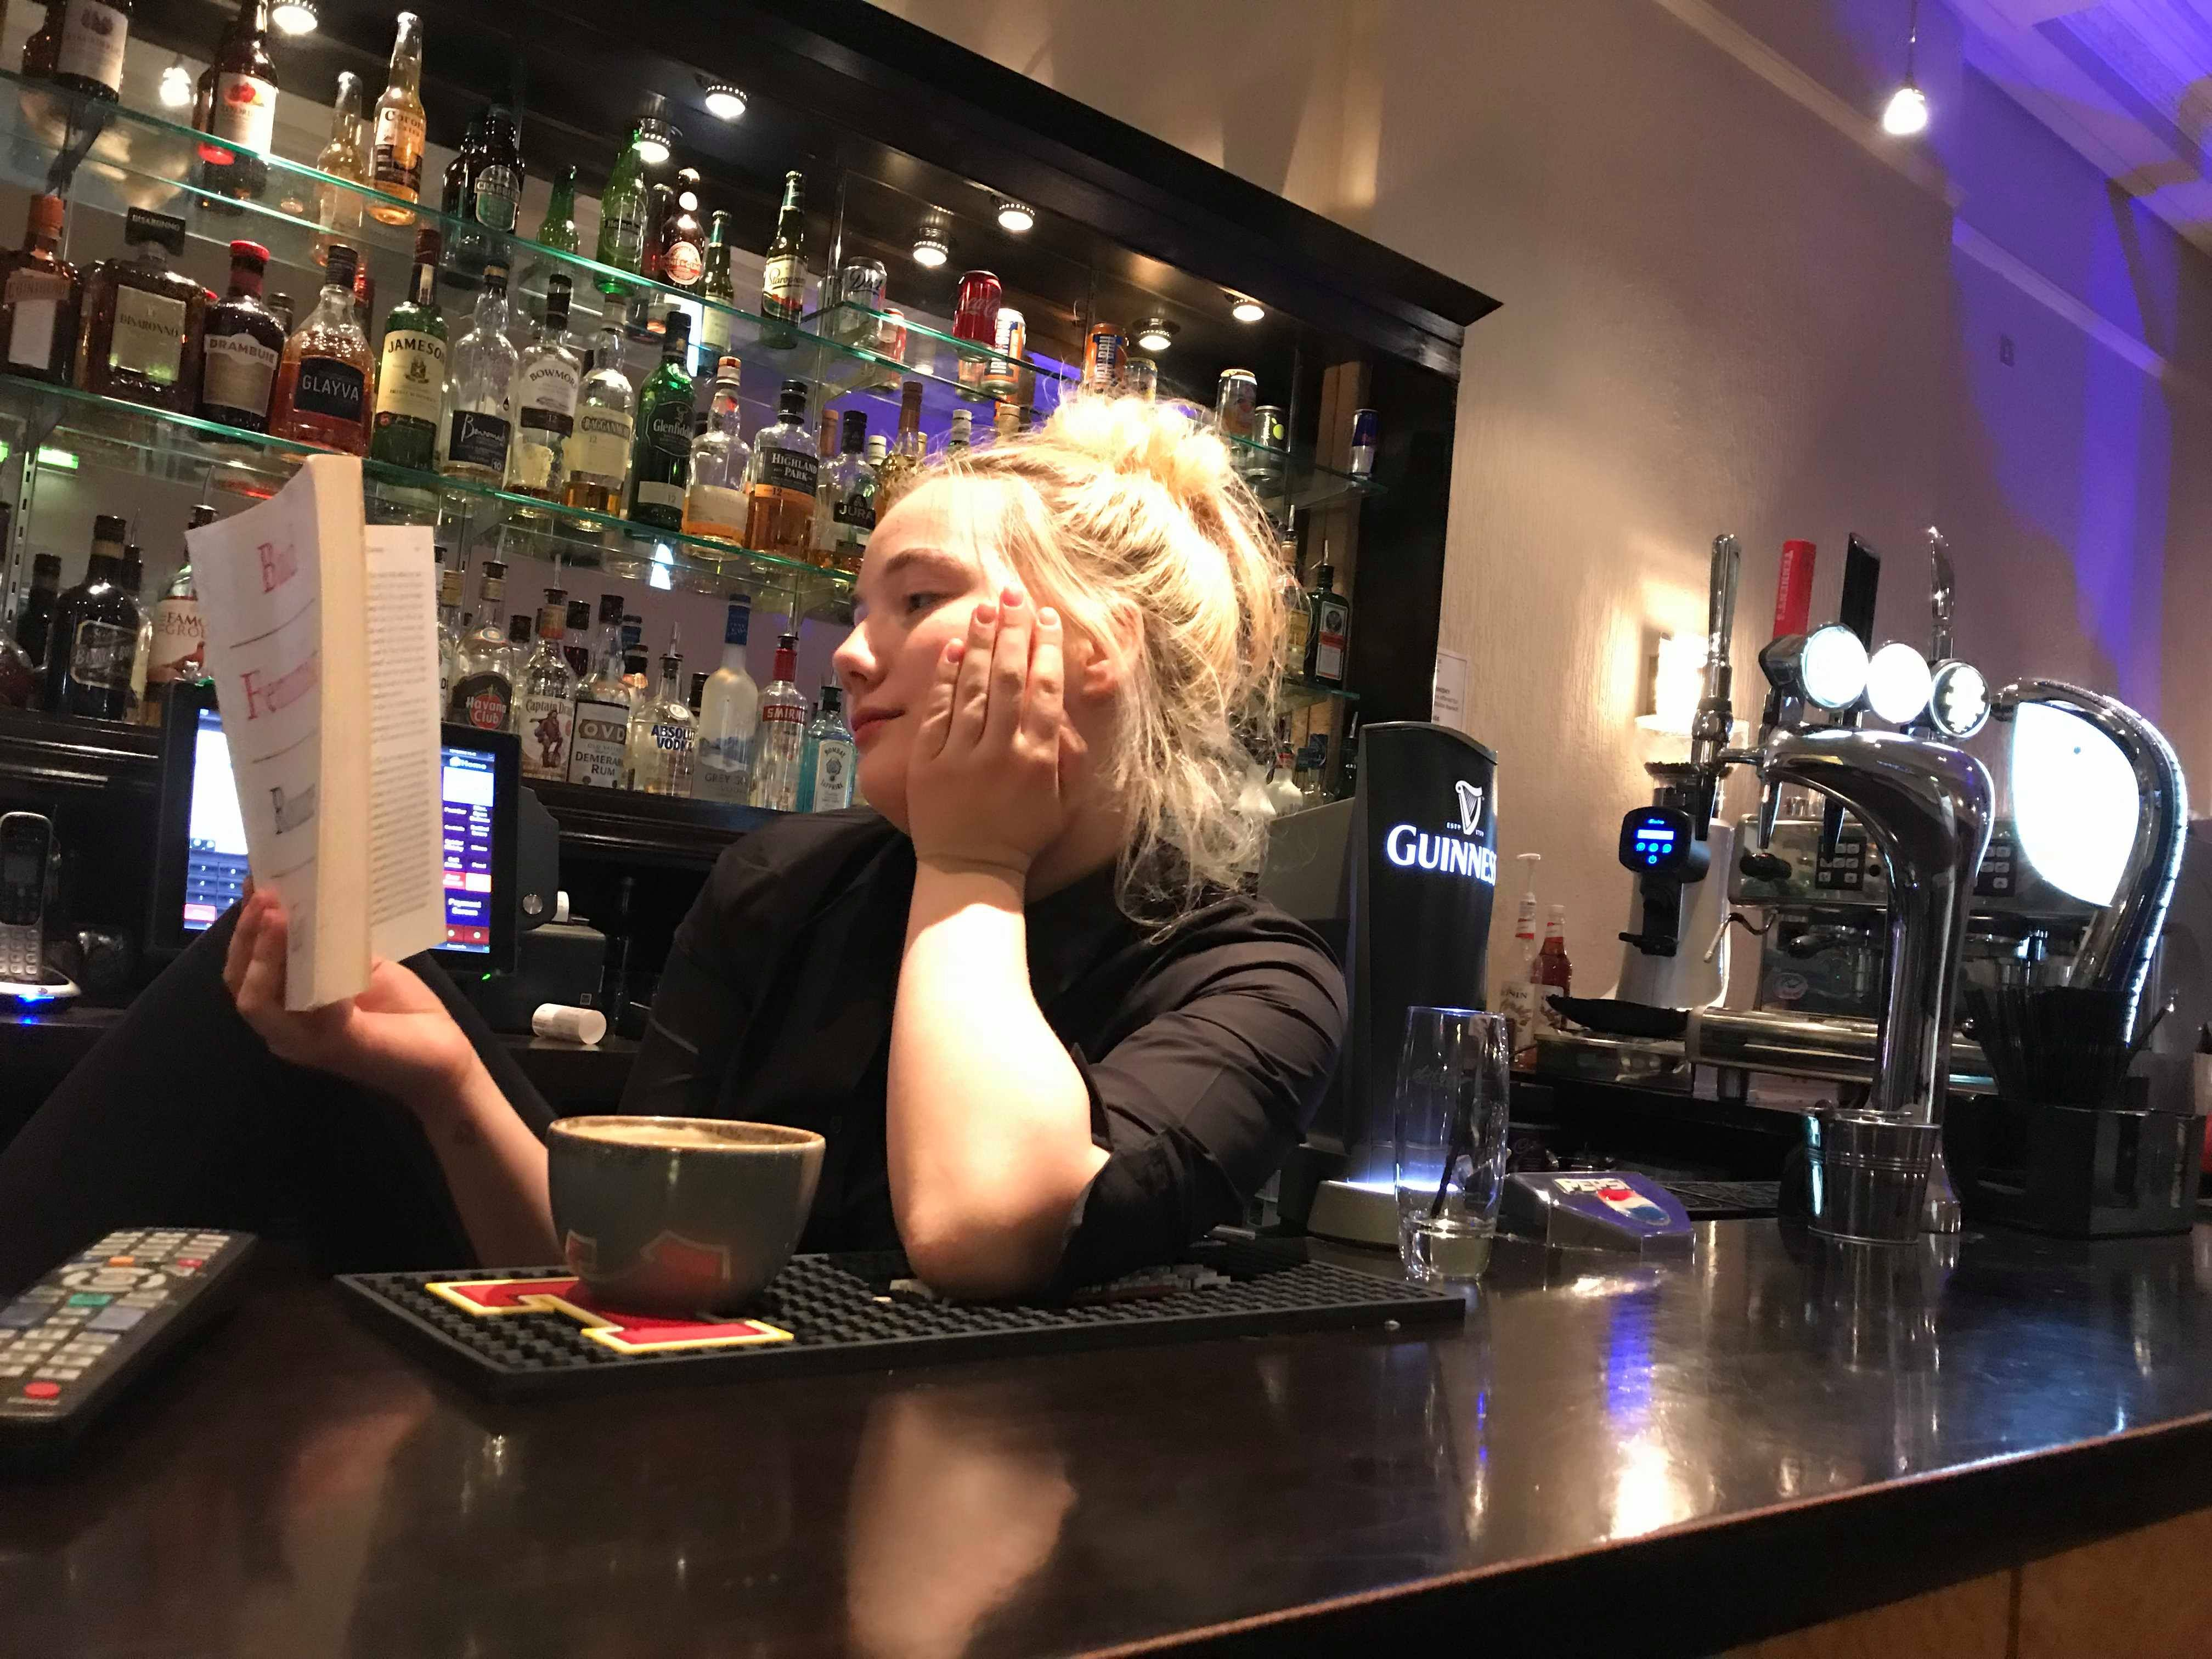 Image may contain: Cup, Pub, Bar Counter